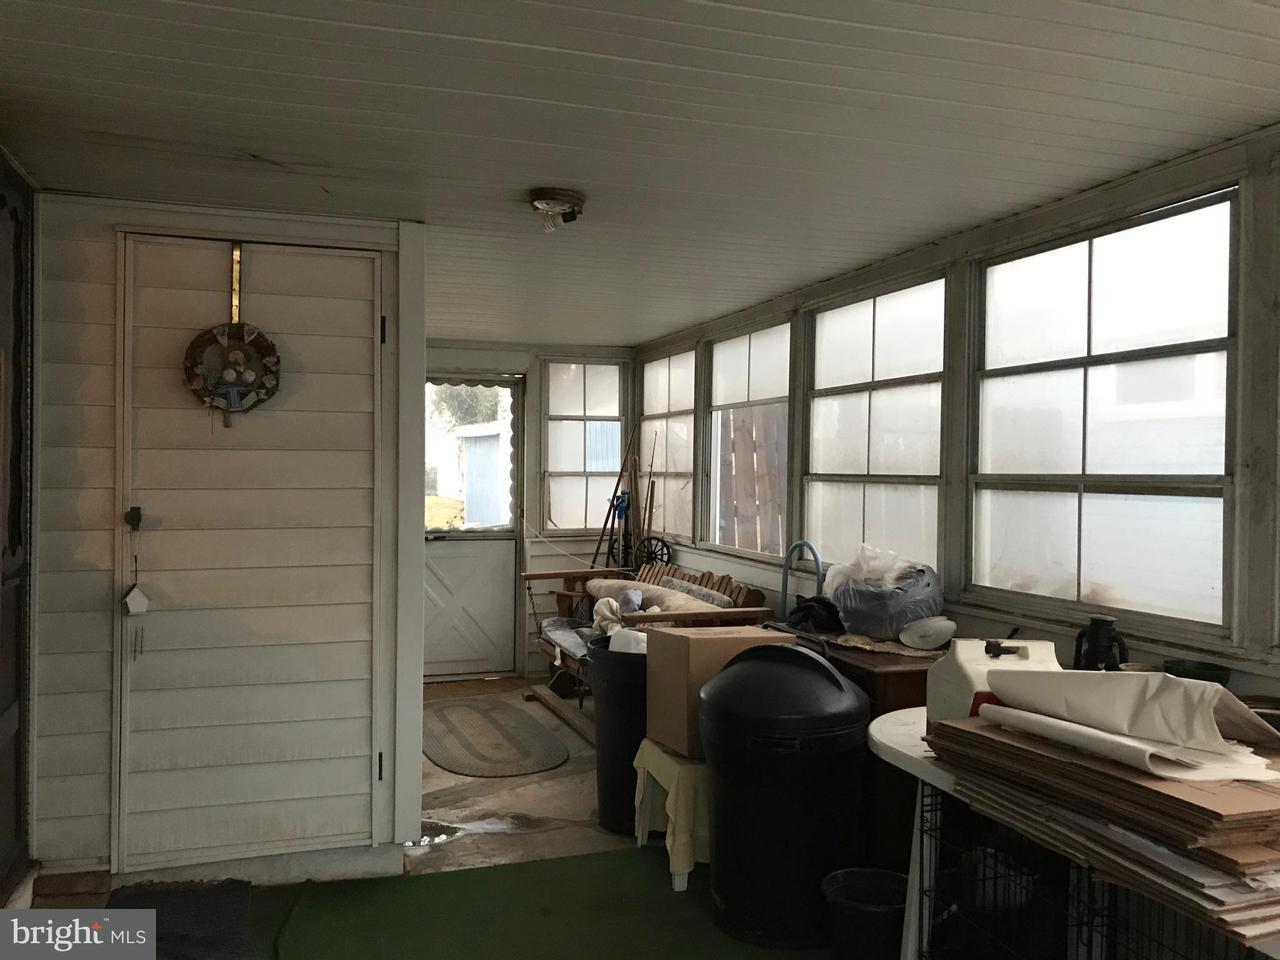 2424  Saratoga Baltimore, MD 21227